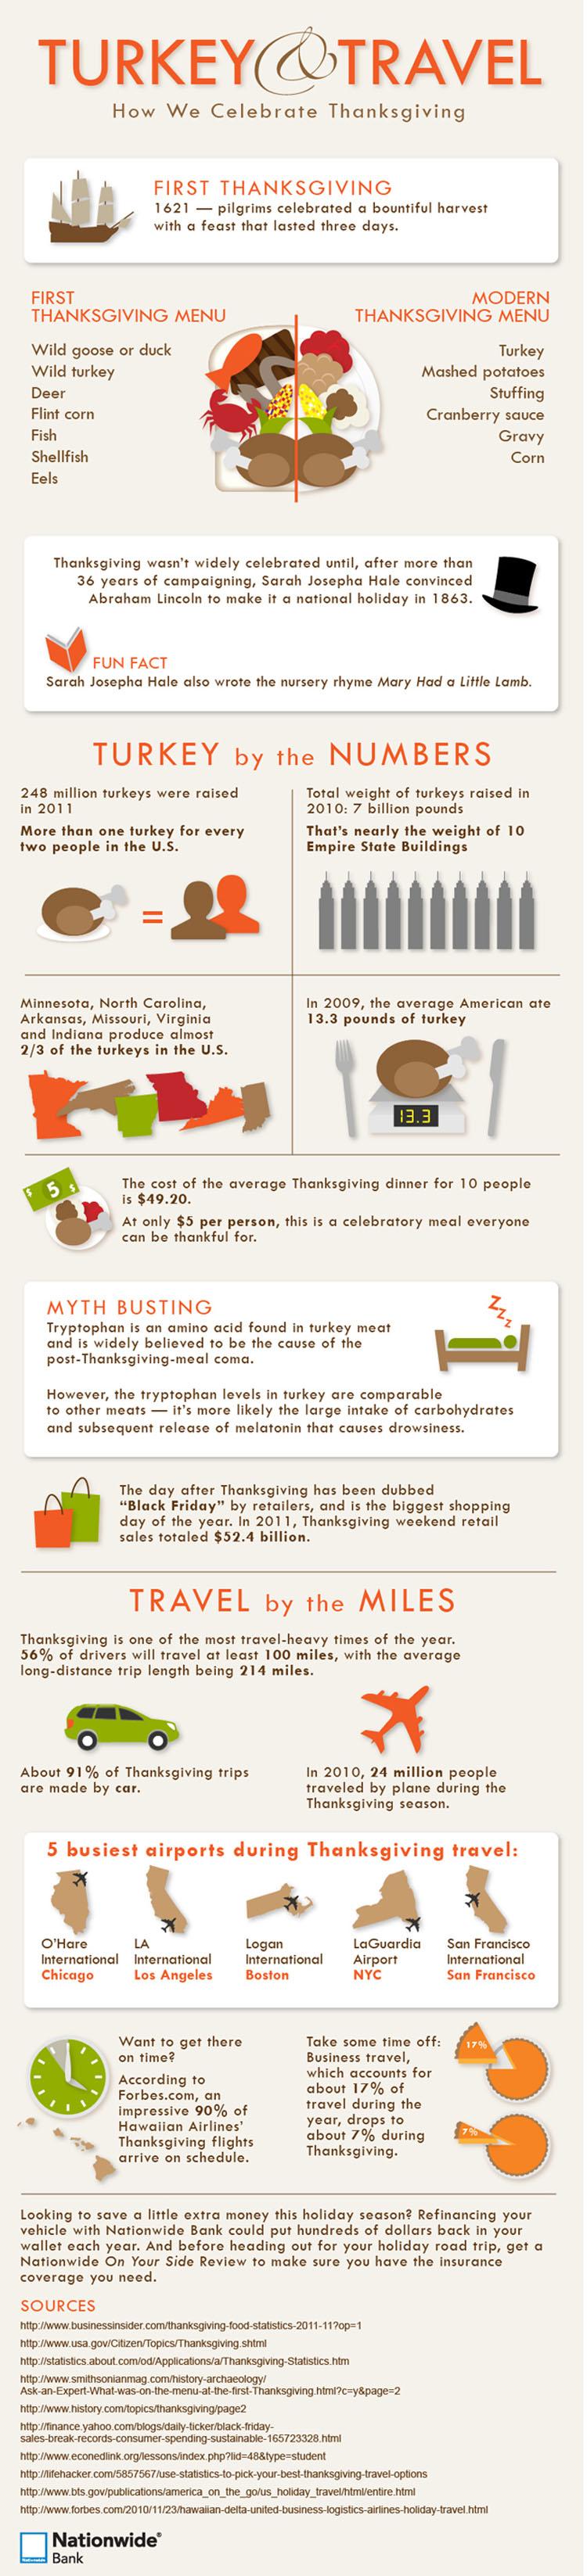 Turkey & Travel: How We Celebrate Thanksgiving